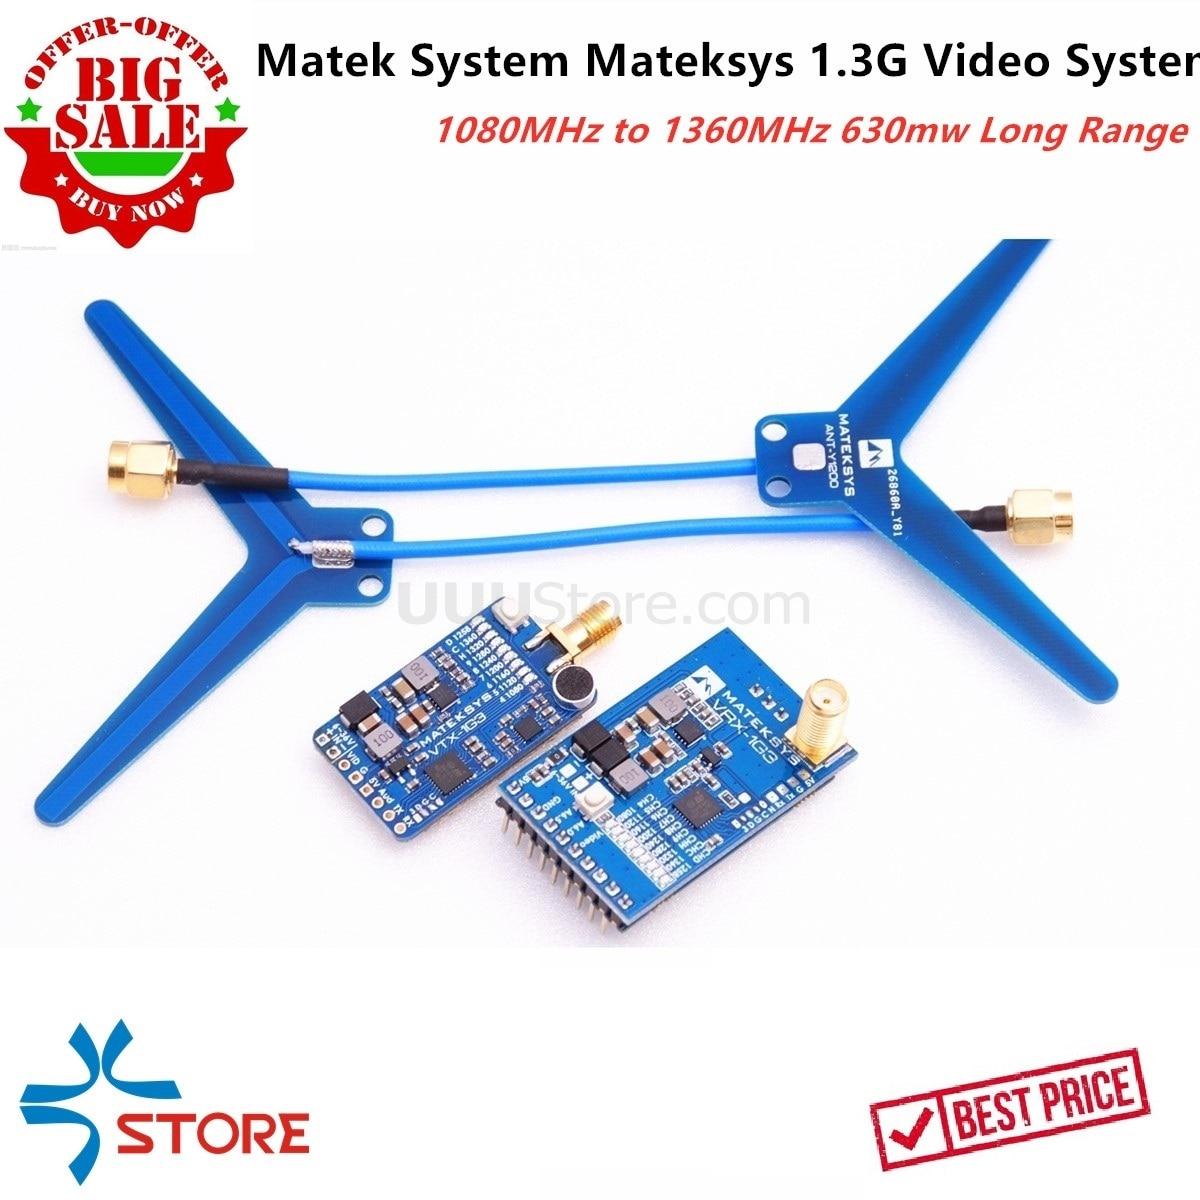 40KM Matek System Mateksys VRX-1G3 VTX-1G3 1.3GHz FPV 2CH-9CH 630mW Video Transmitter Wid Band Receiver RC Drone Long Range